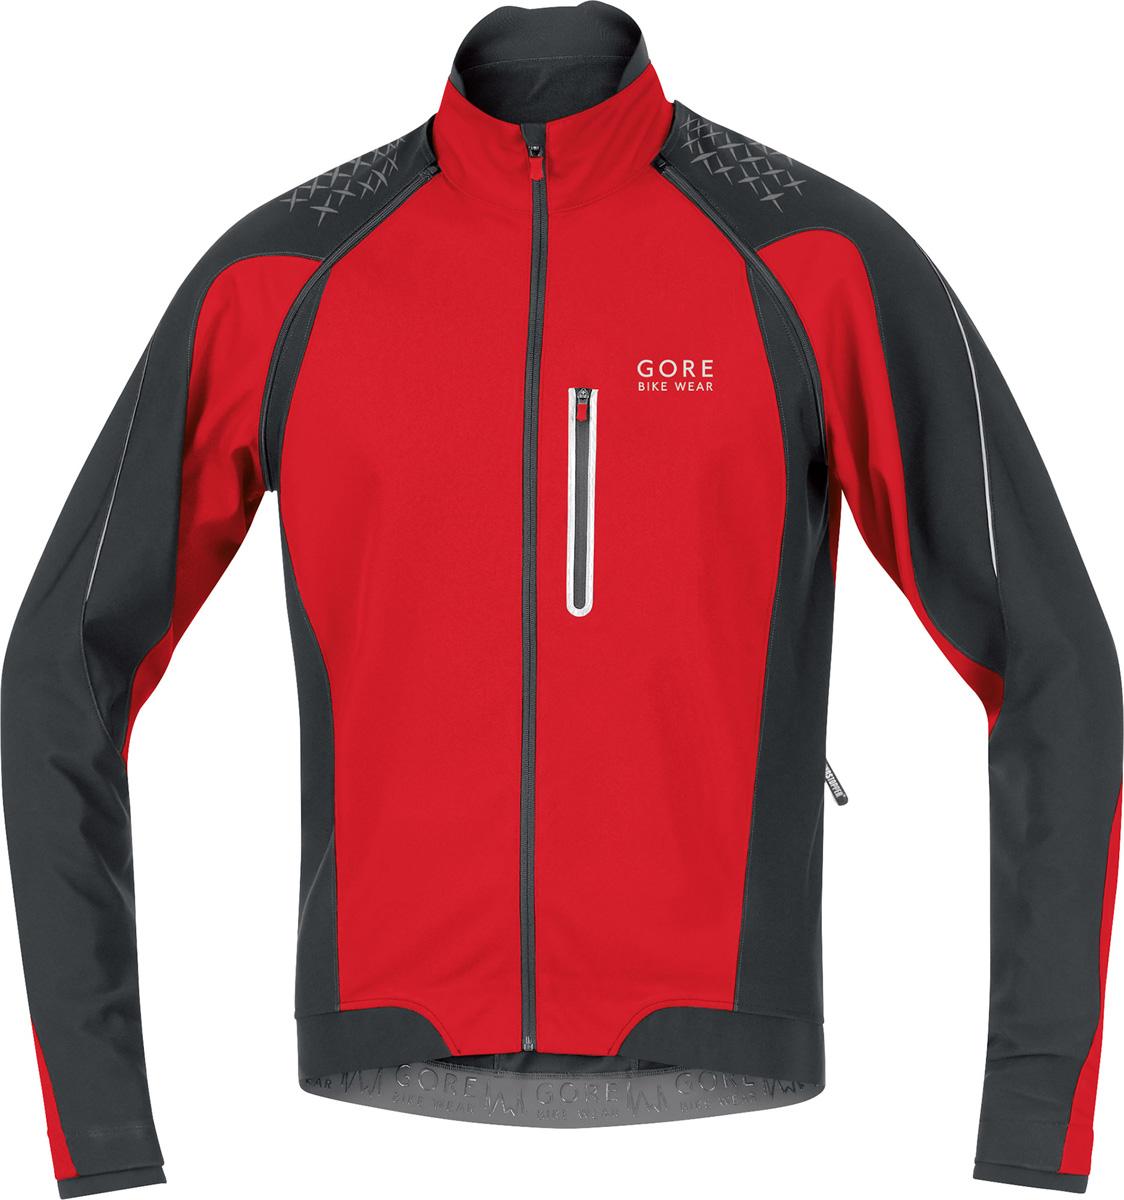 Wear 2 Soft Gregg's Off Alp Jacket 0 Gore Shell X Zip Cycles CxoBerdW